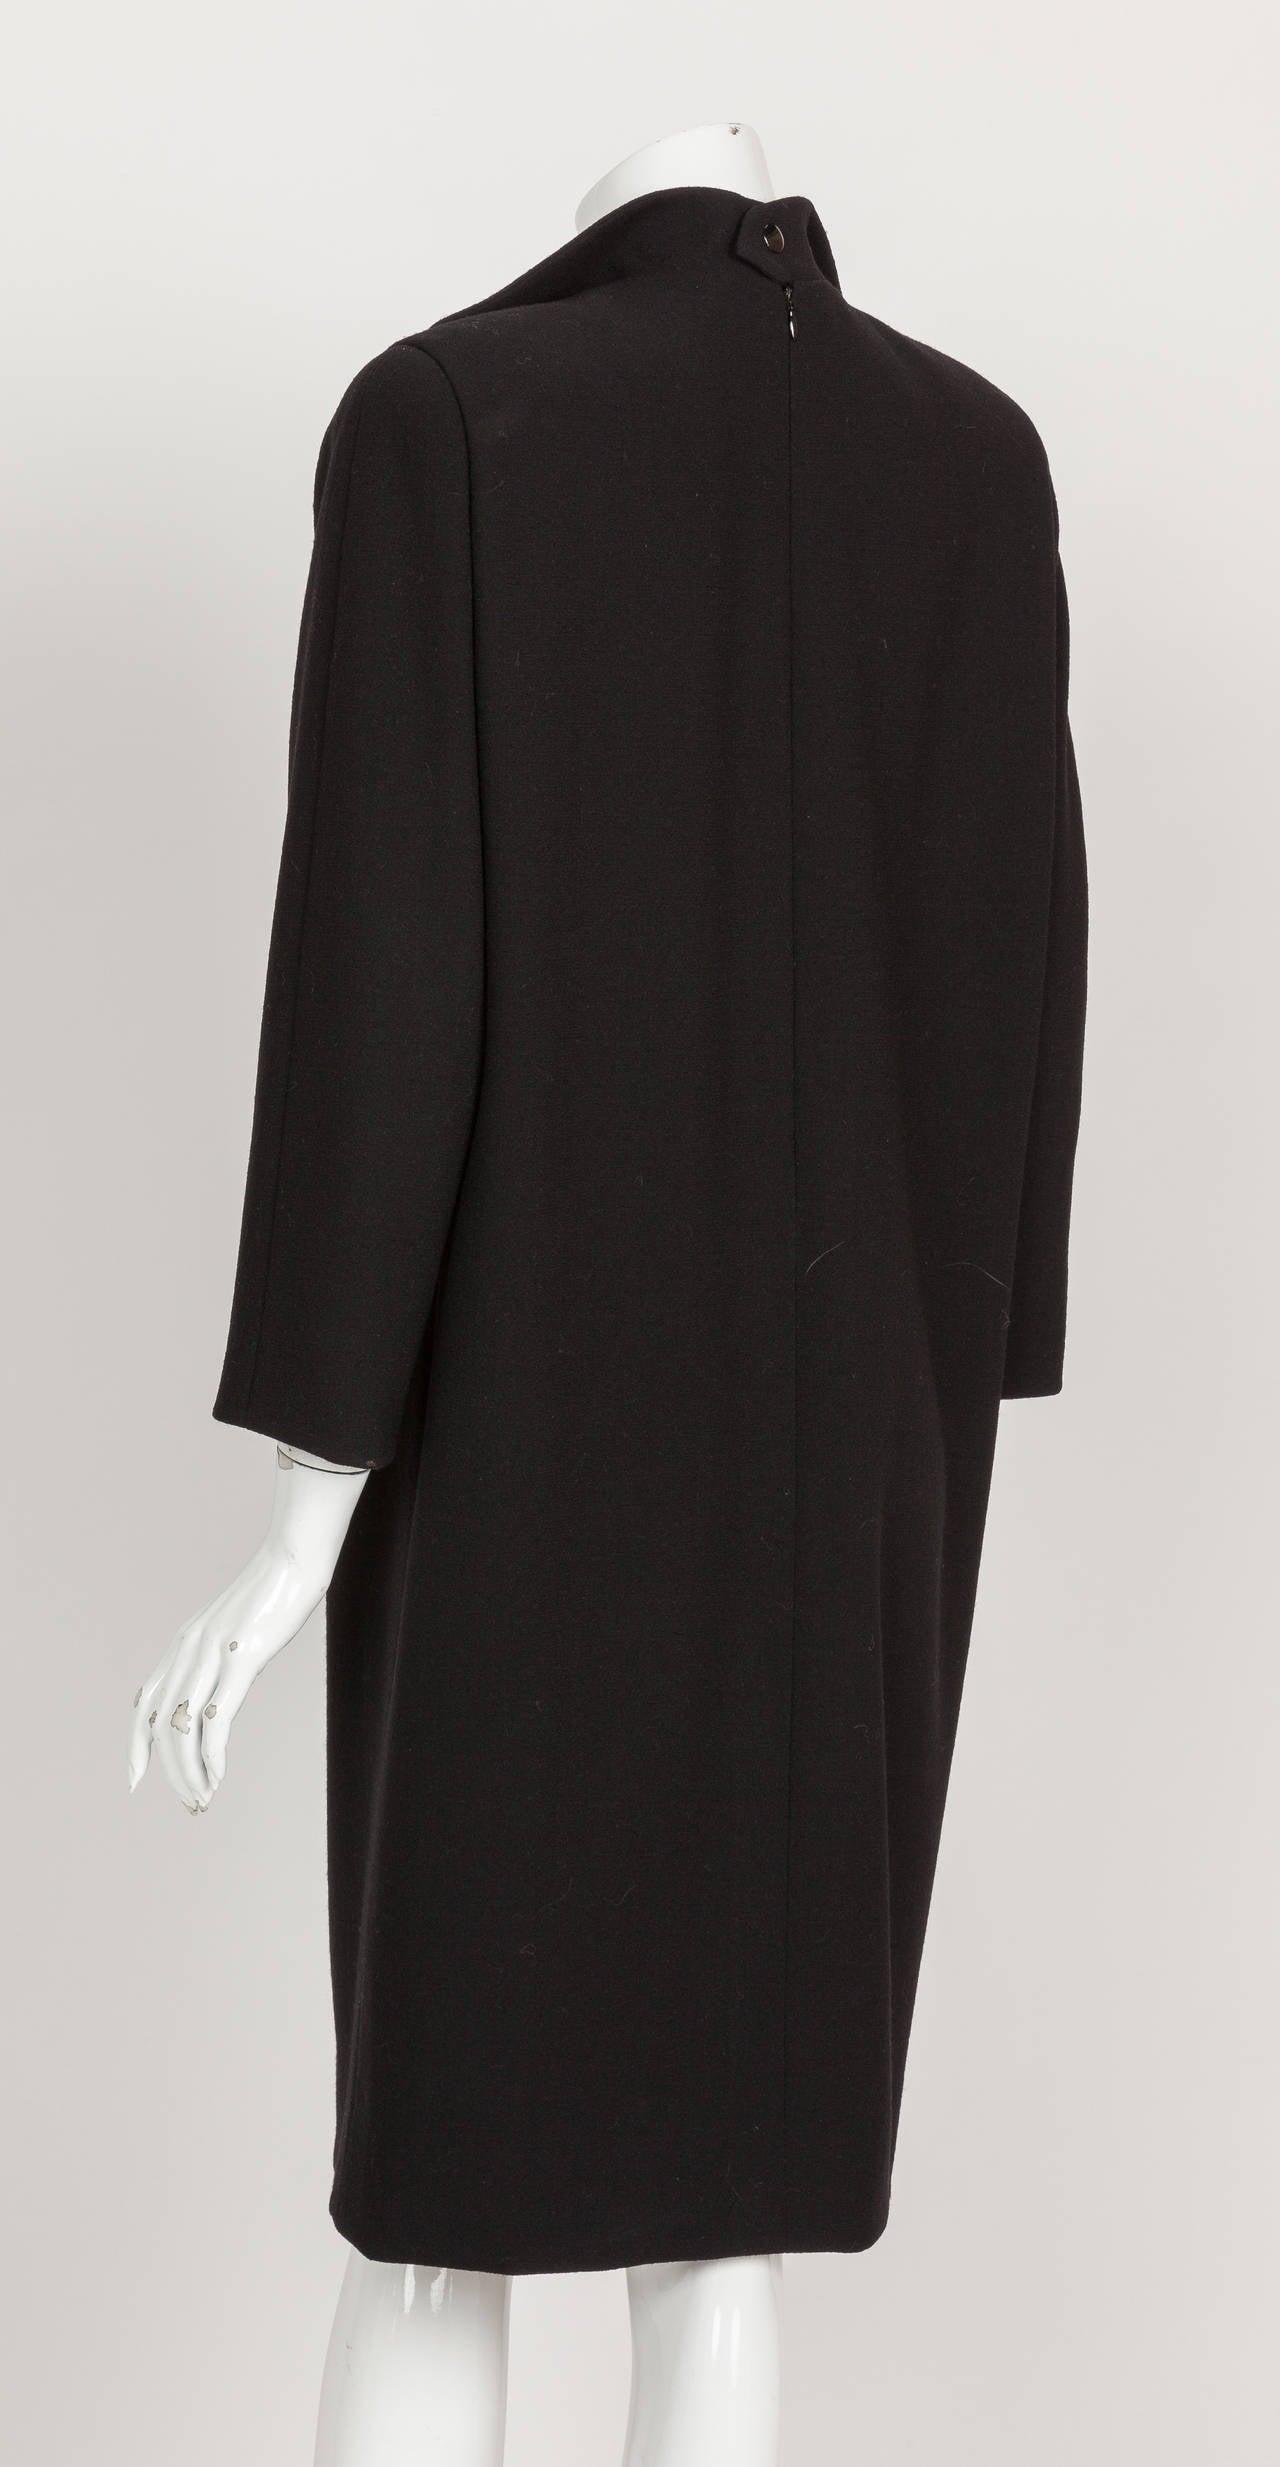 Pierre Cardin Haute Couture Wool Cocktail Dress w/Petalled Lapel ca. 1992 5